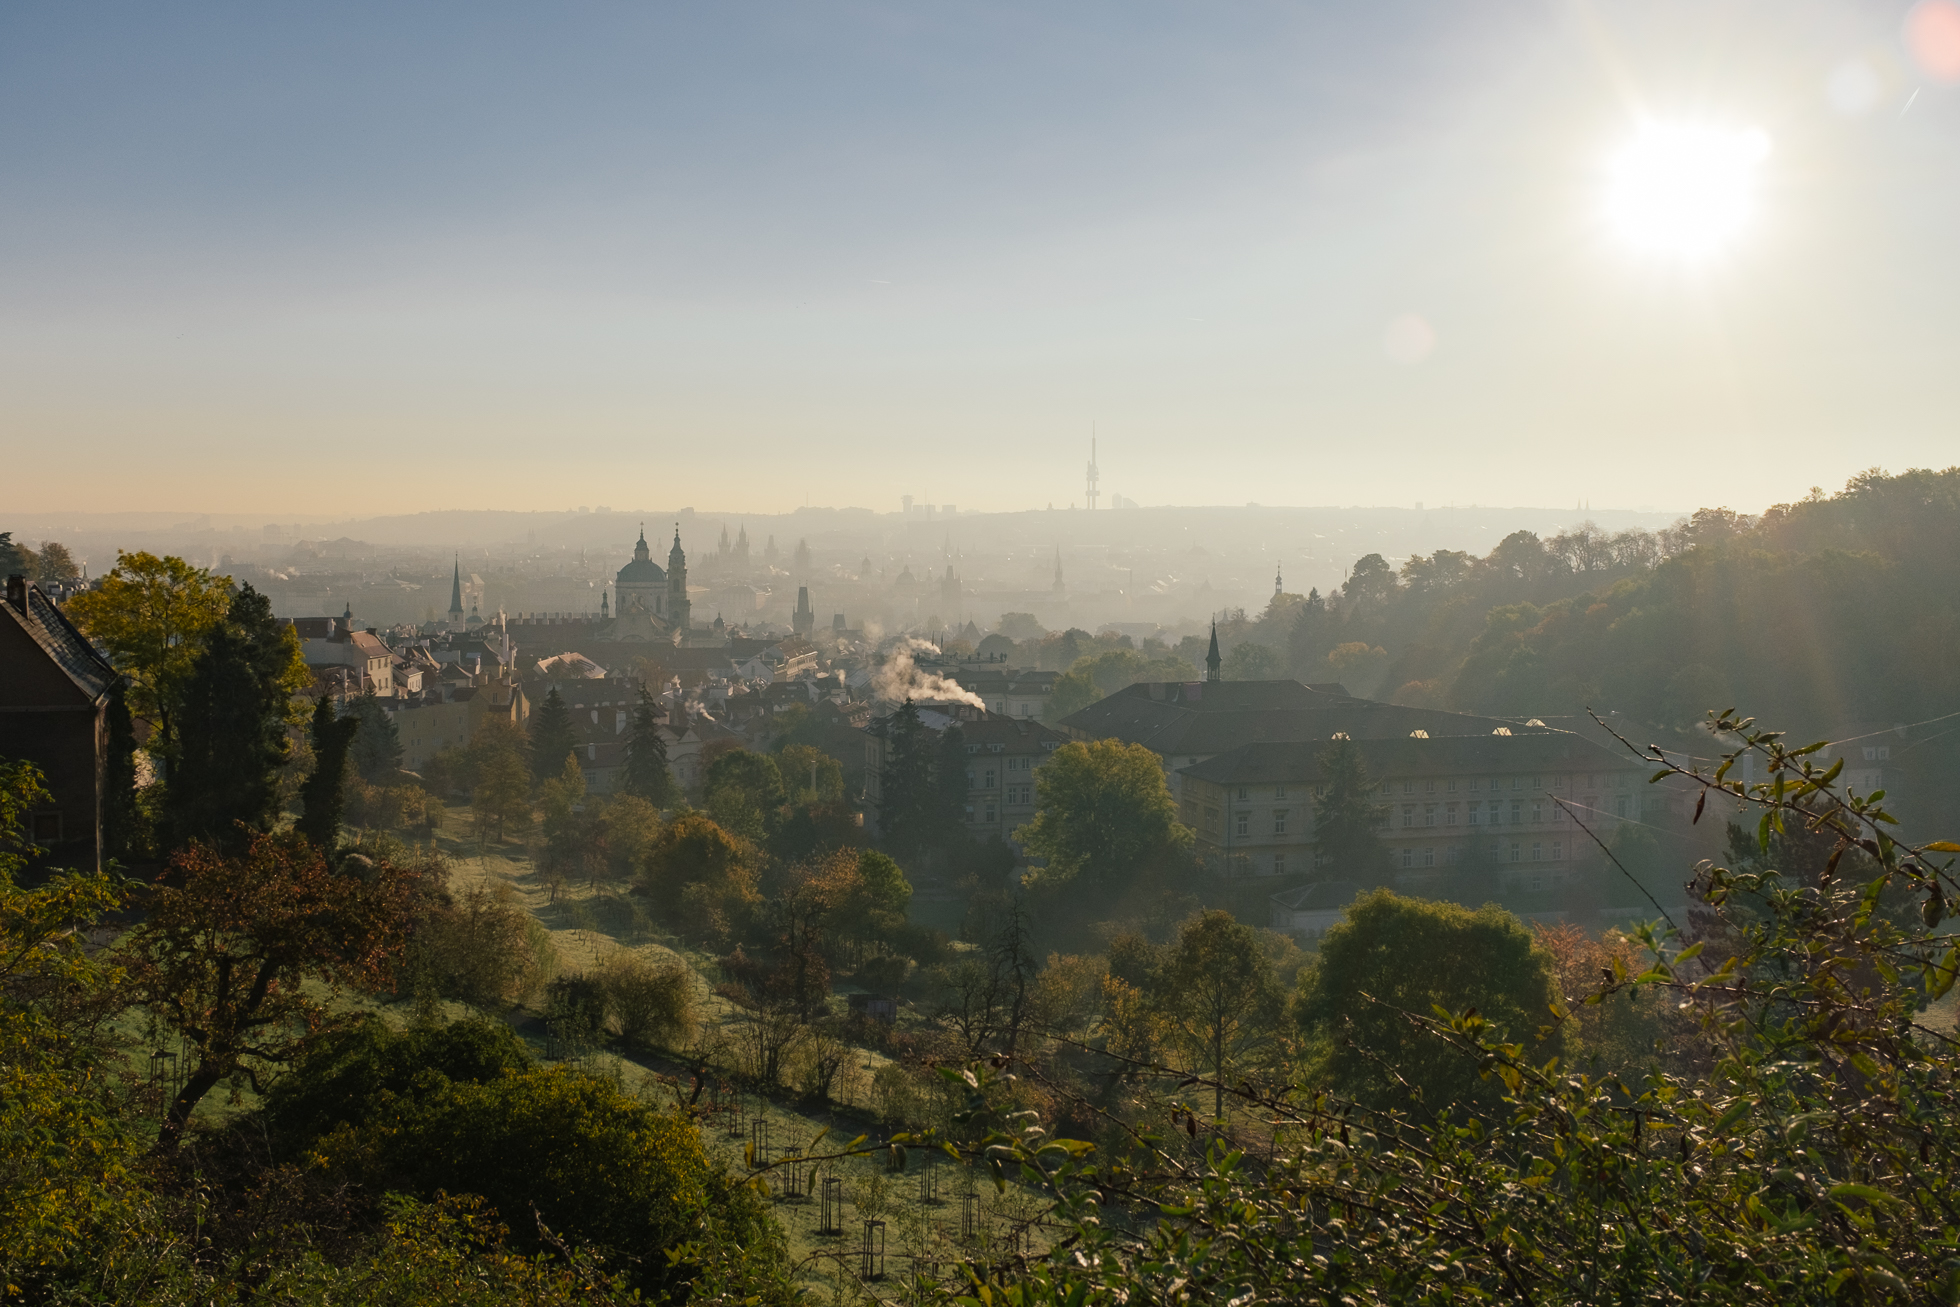 View of Prague from Strahov Monastery. photo: Chris Lettner